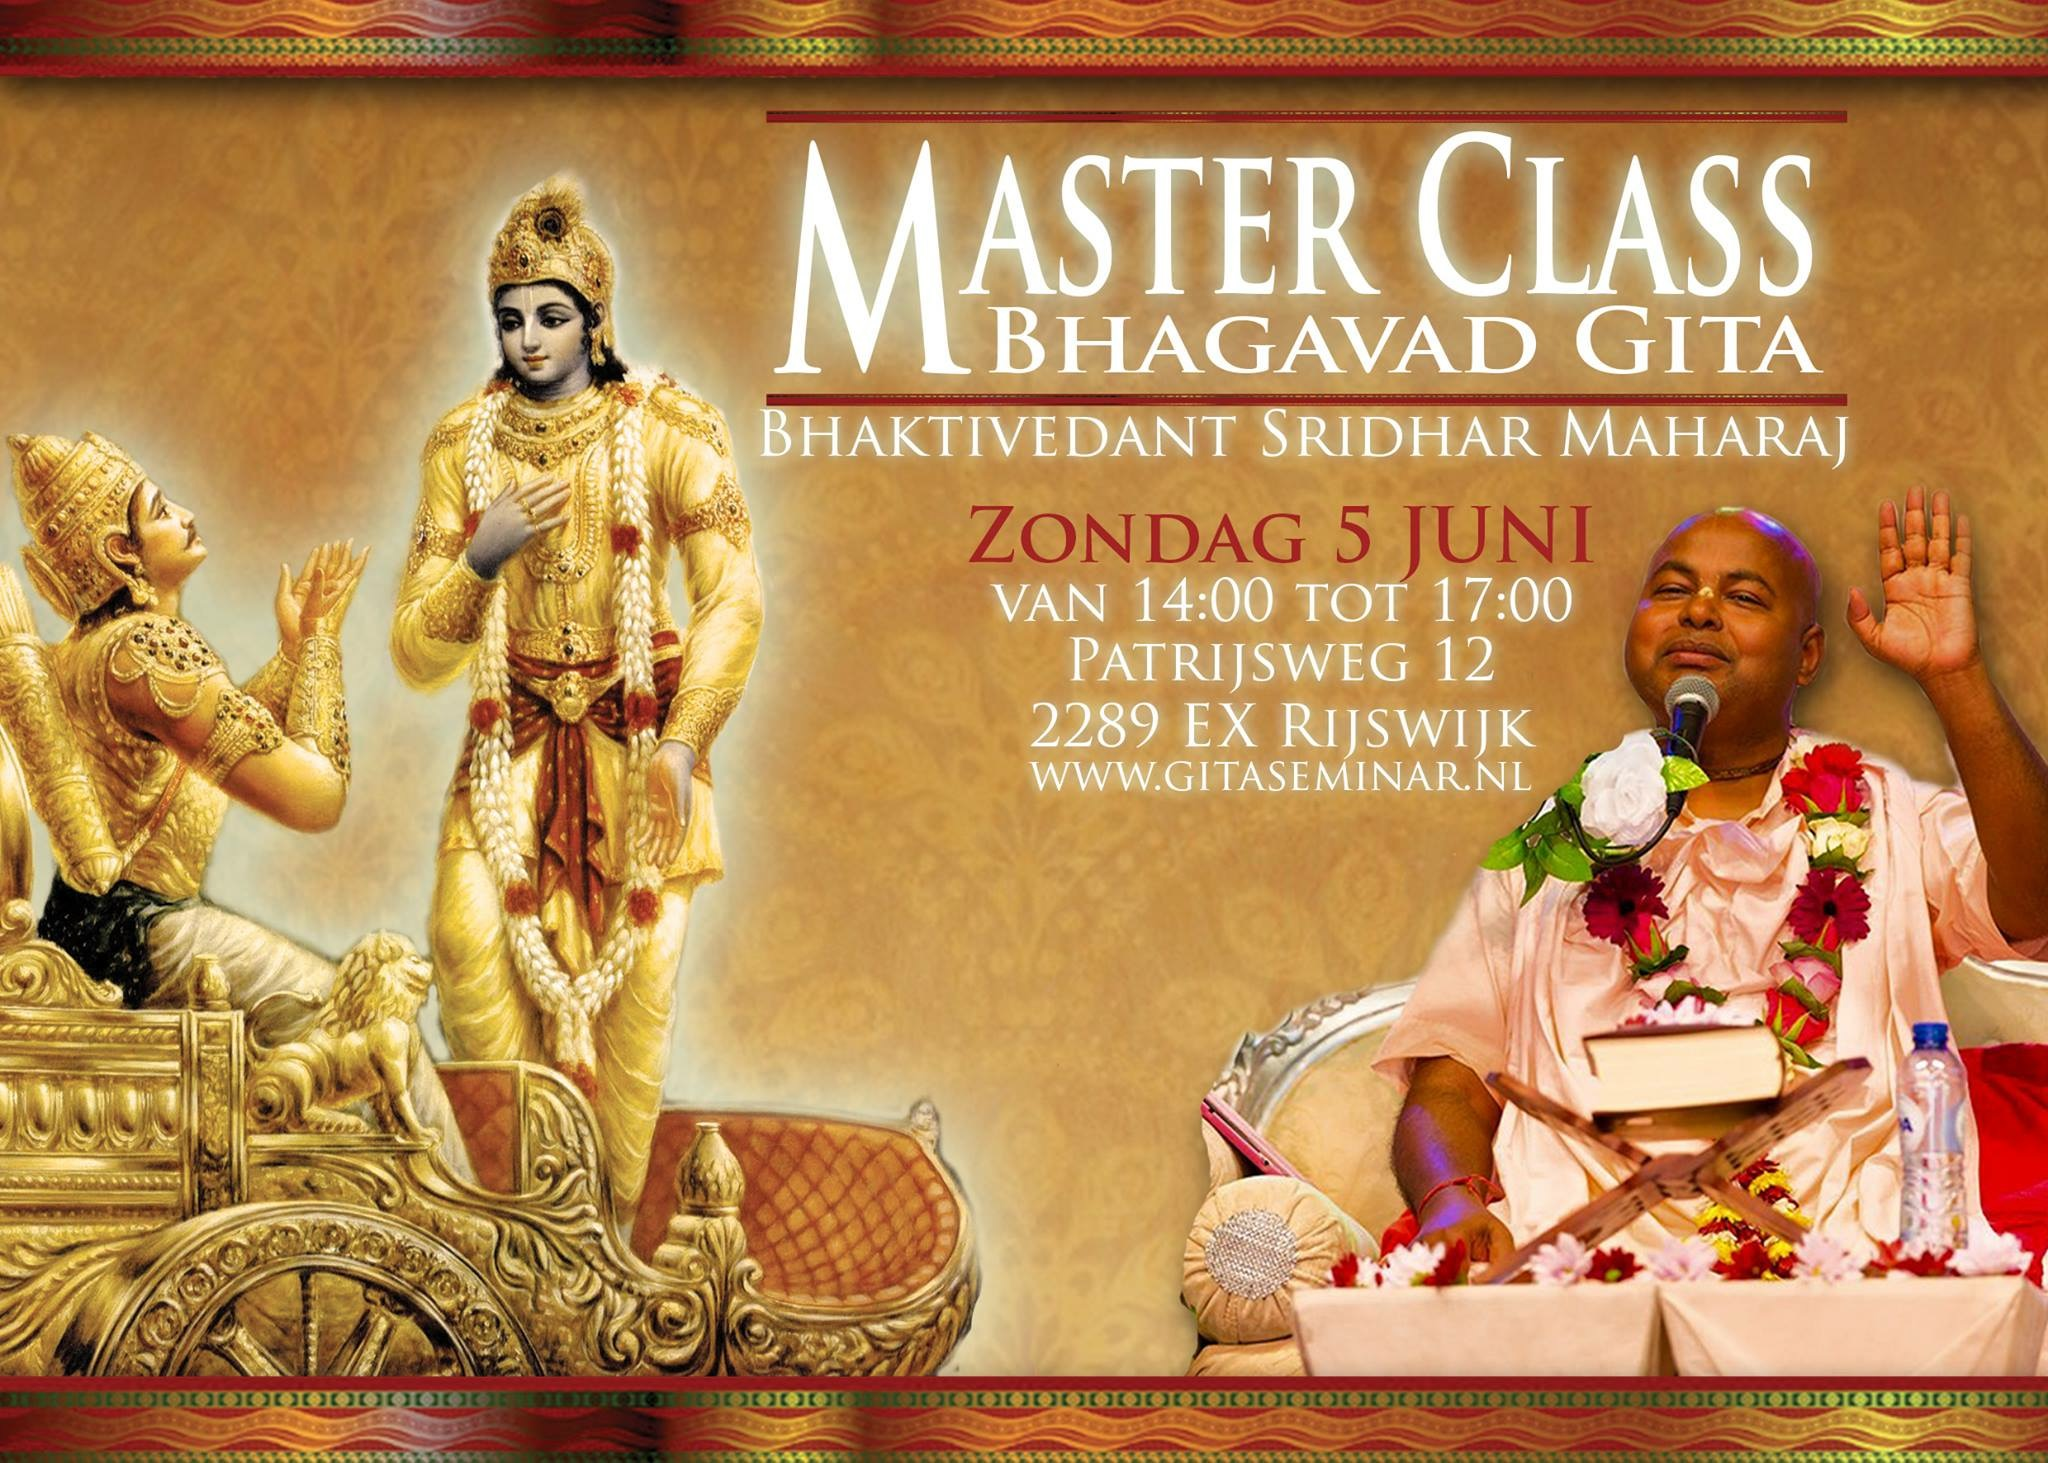 Citaten Uit Bhagavad Gita : Masterclass met sripad bv sridhar maharaj juni